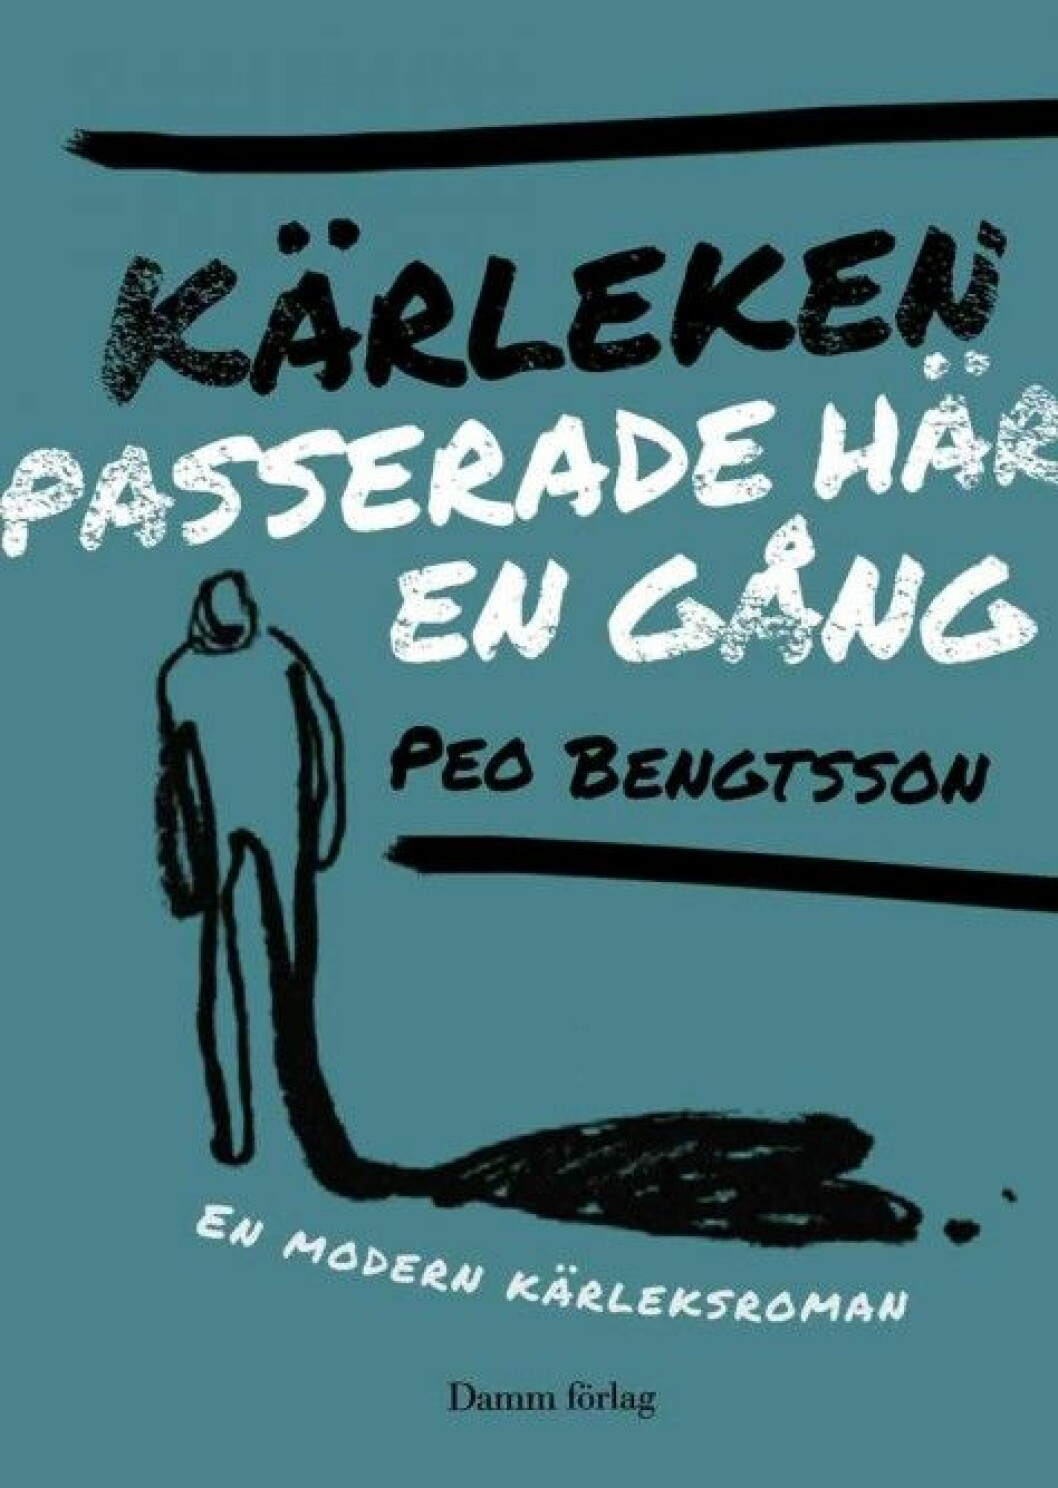 Peo-Bengtsson-Karleken-passerade